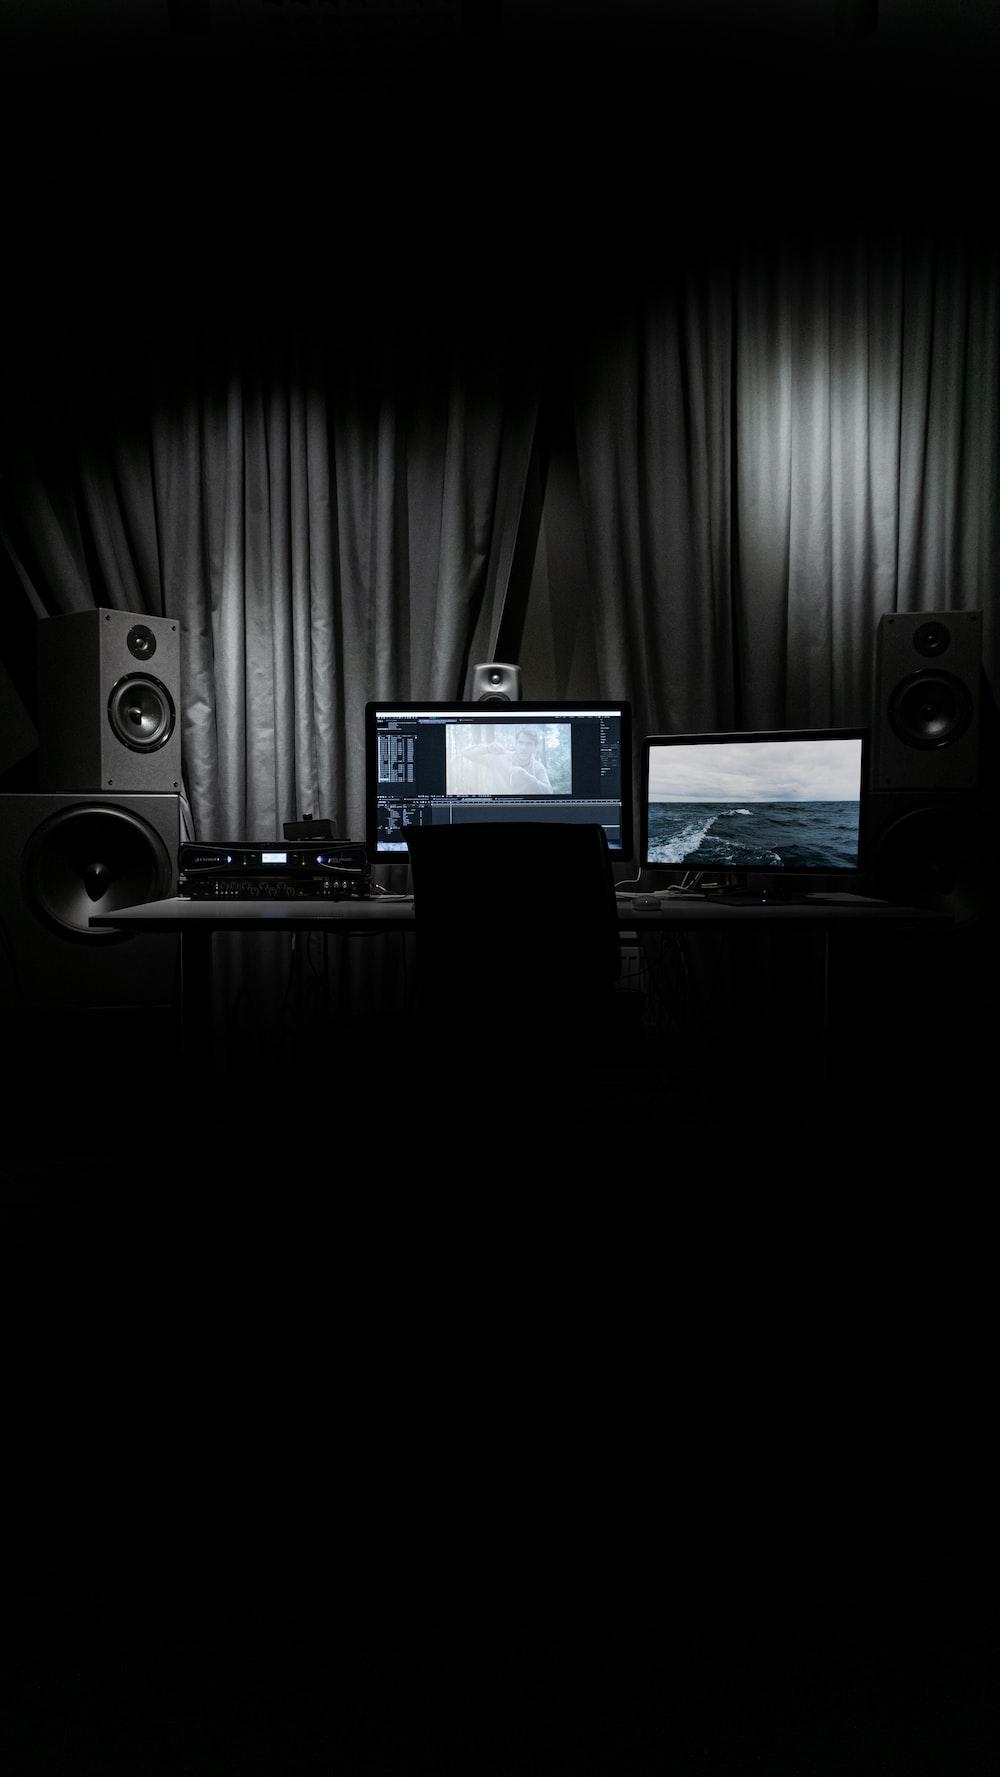 black laptop computer turned on beside black speaker